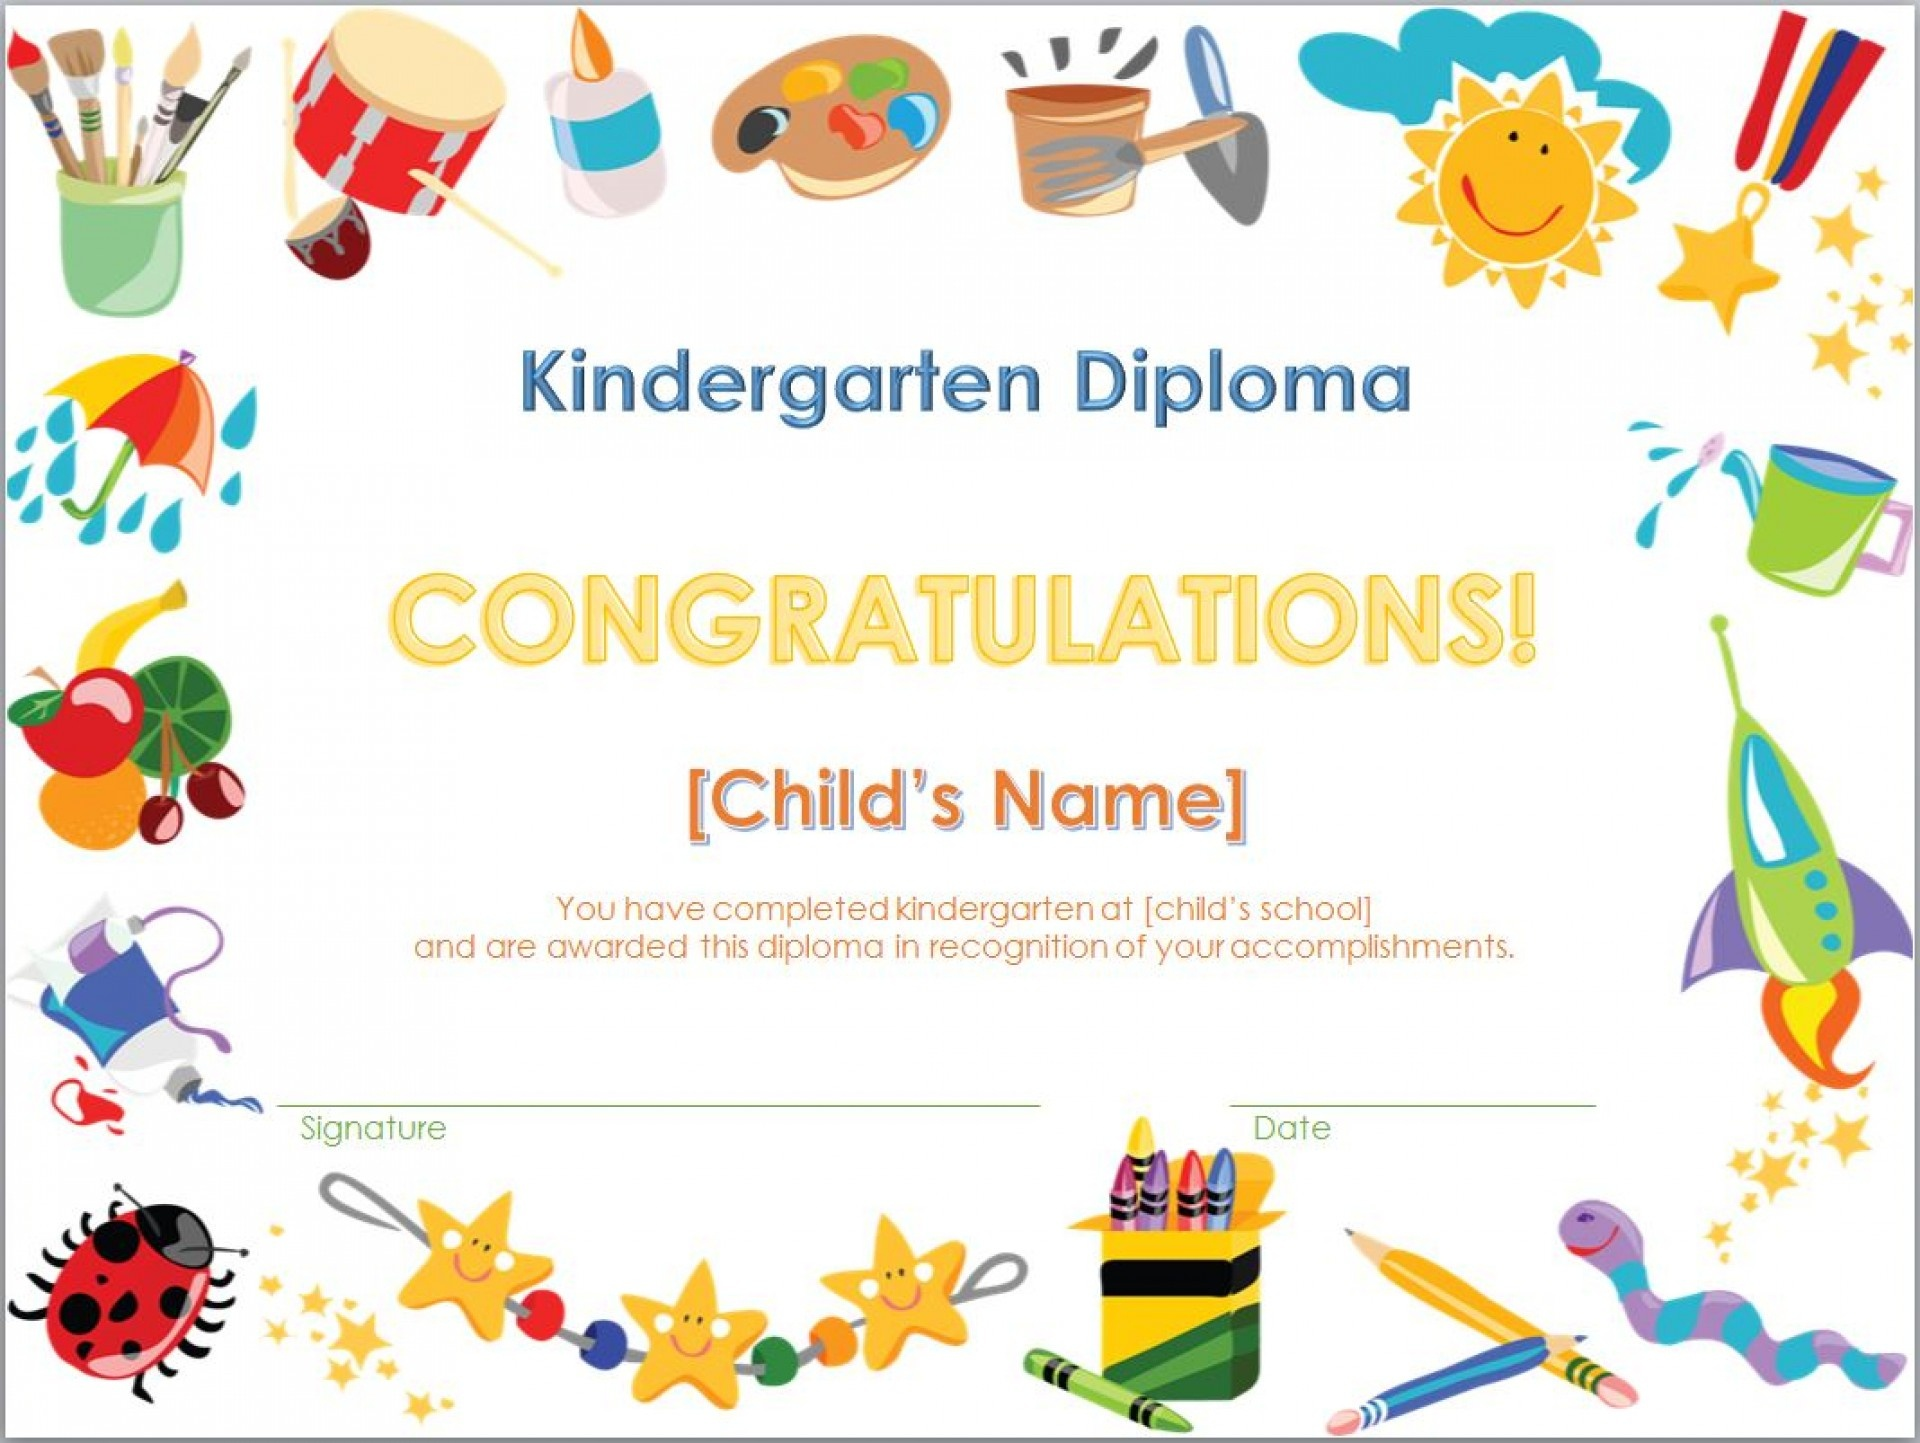 014 Free Printables X Graduation Certificate And Templates Template - Preschool Graduation Diploma Free Printable